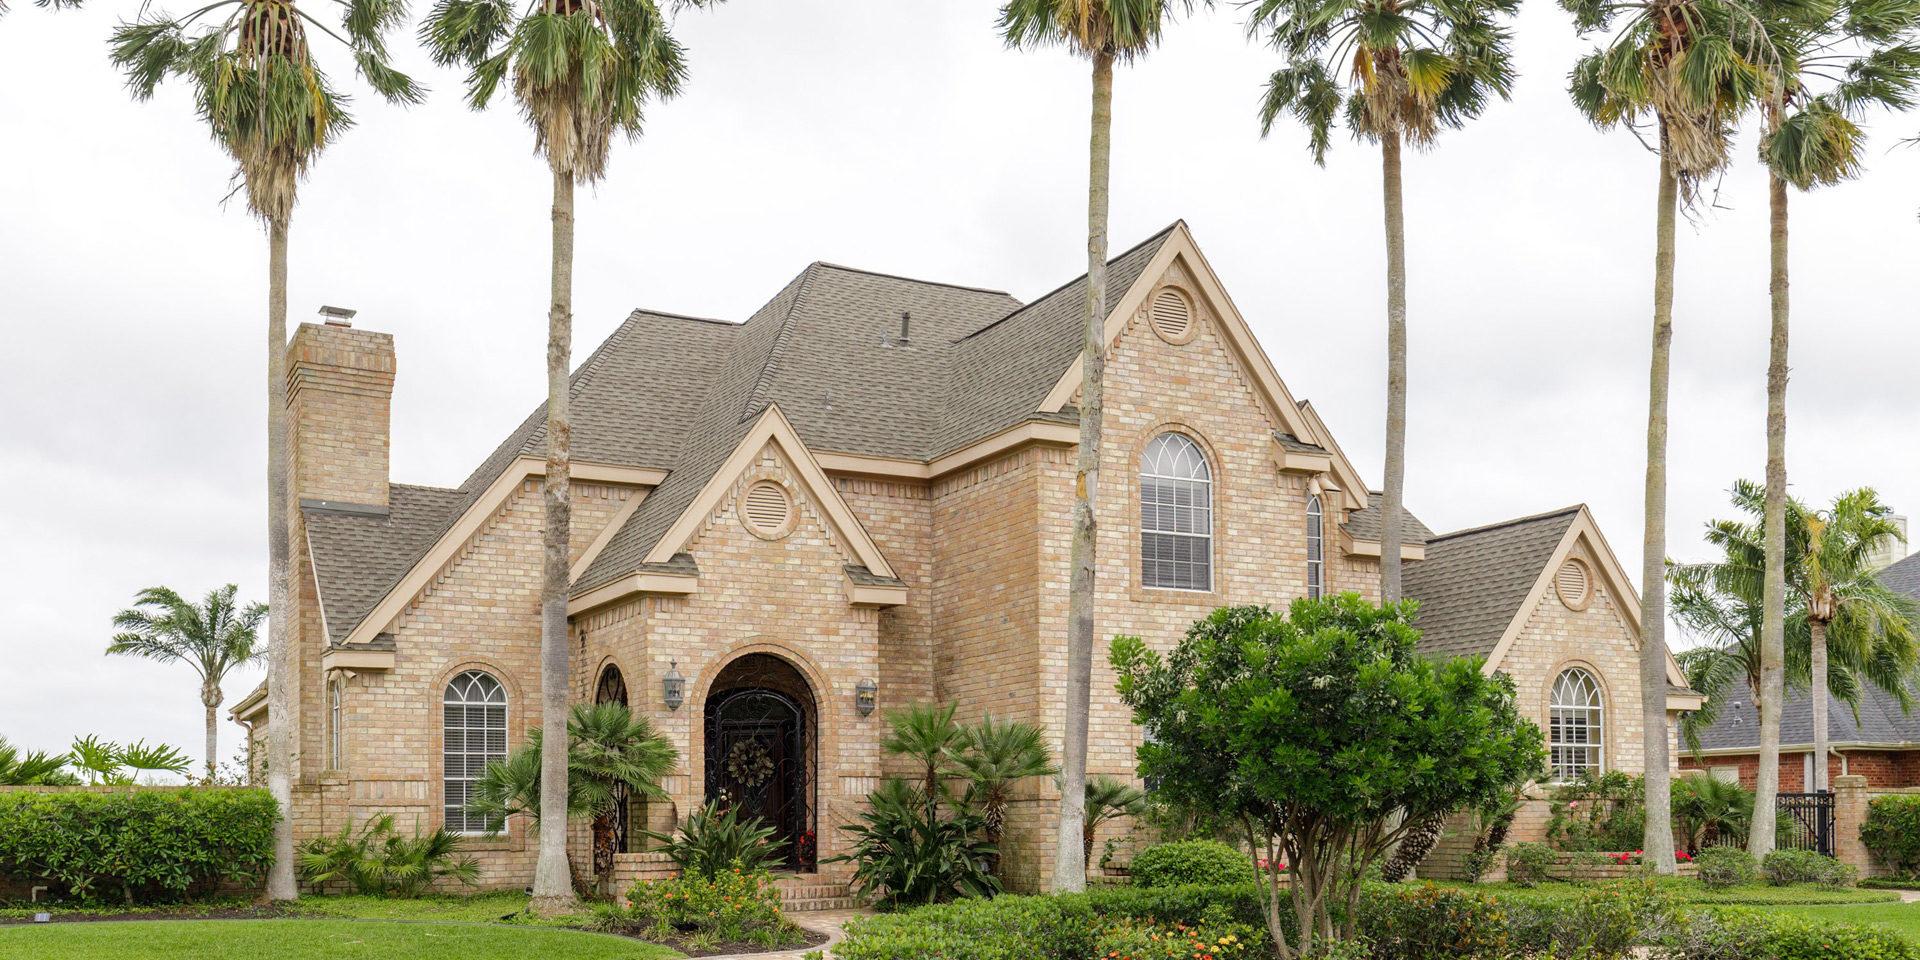 Homes for Sale in Corpus Christi TX - Char Atnip